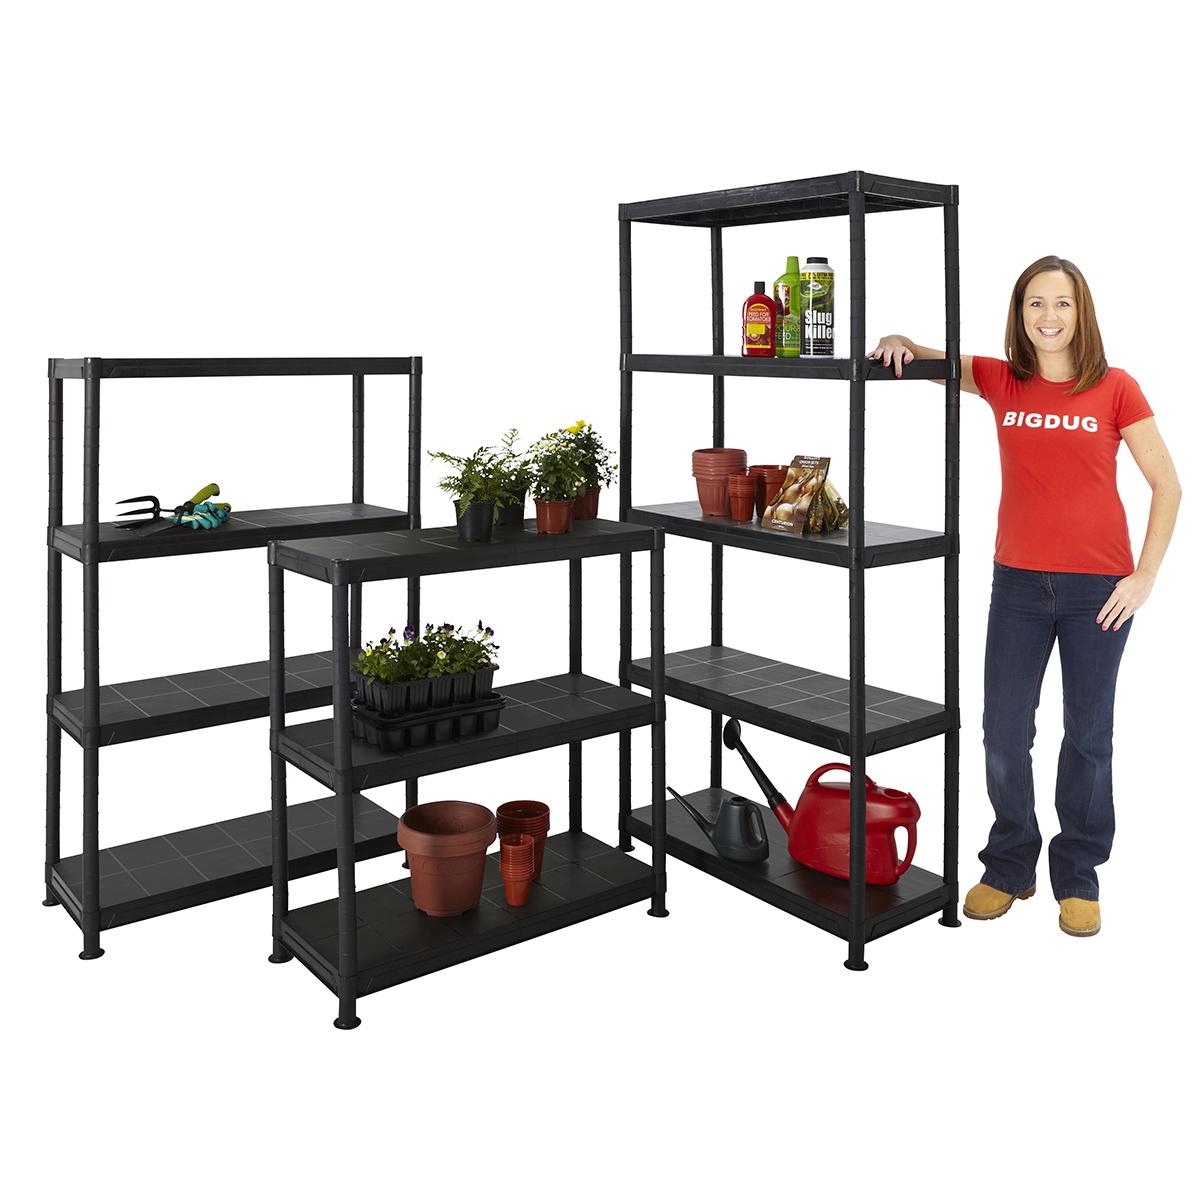 Plastic Shelves Storage Shelf Shelving Garden Garage Shed